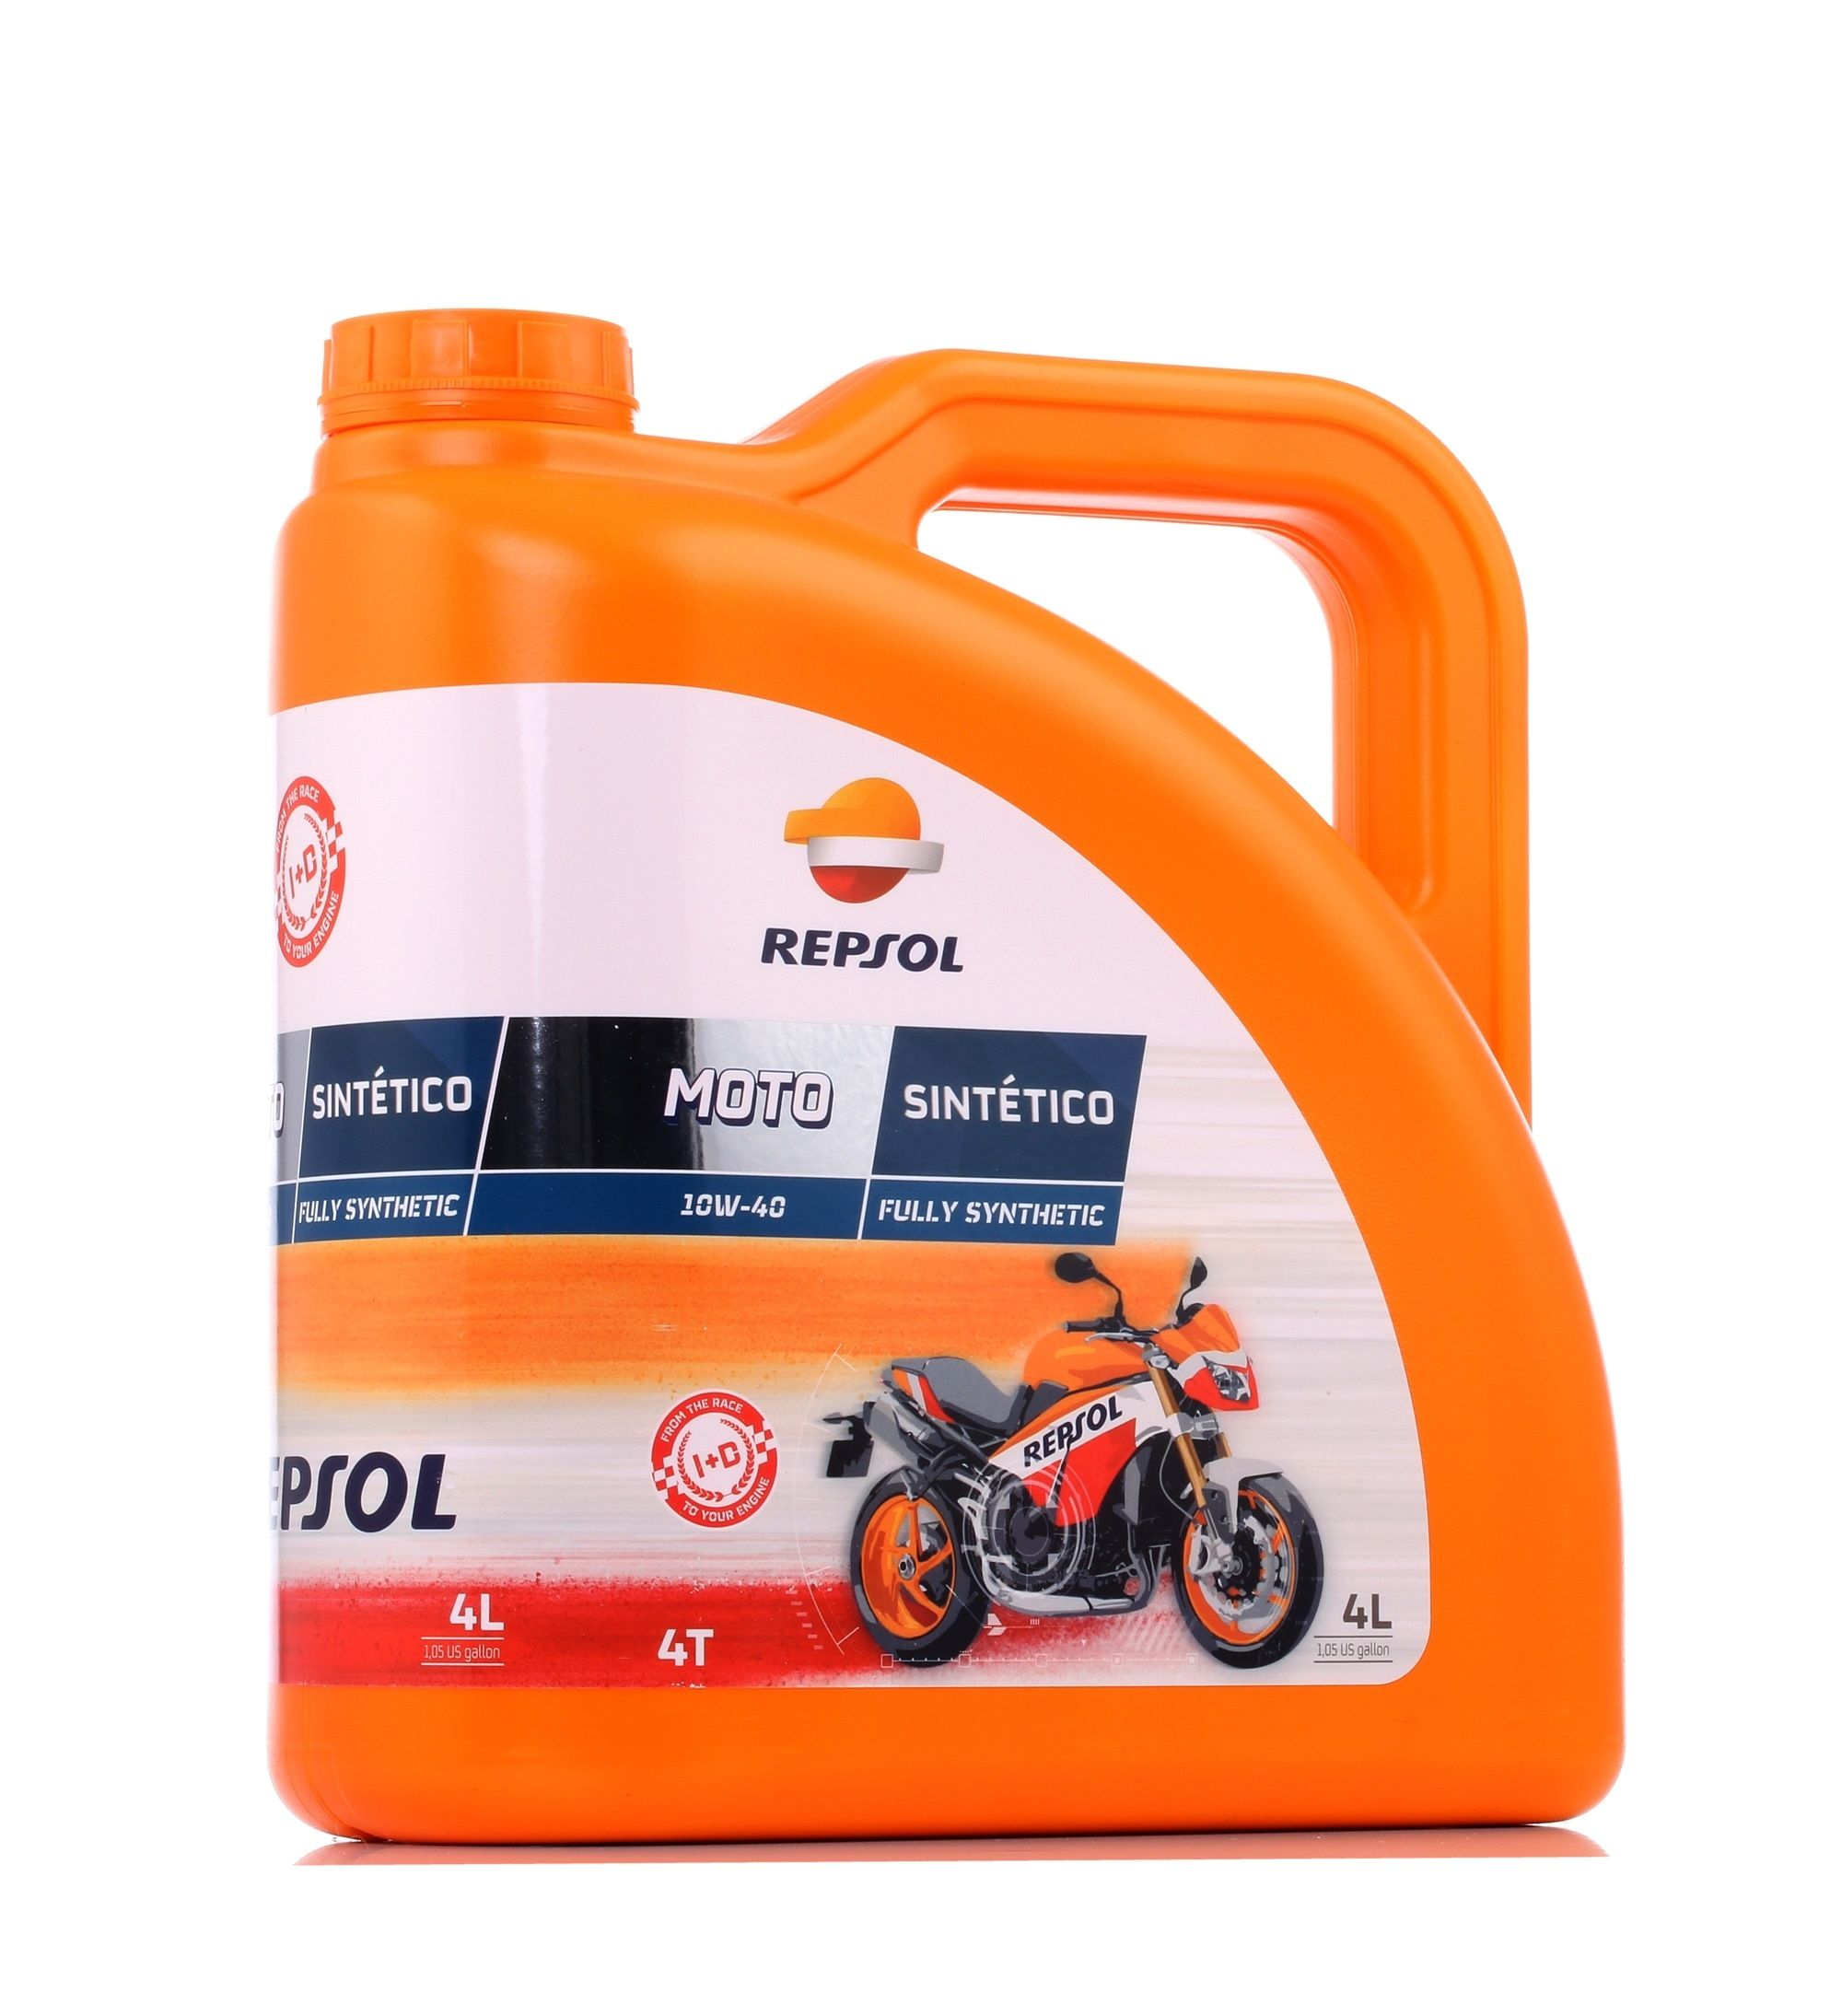 Moto REPSOL MOTO, Sintetico 4T 10W-40, 4l, Synthetiköl Motoröl RP163N54 günstig kaufen